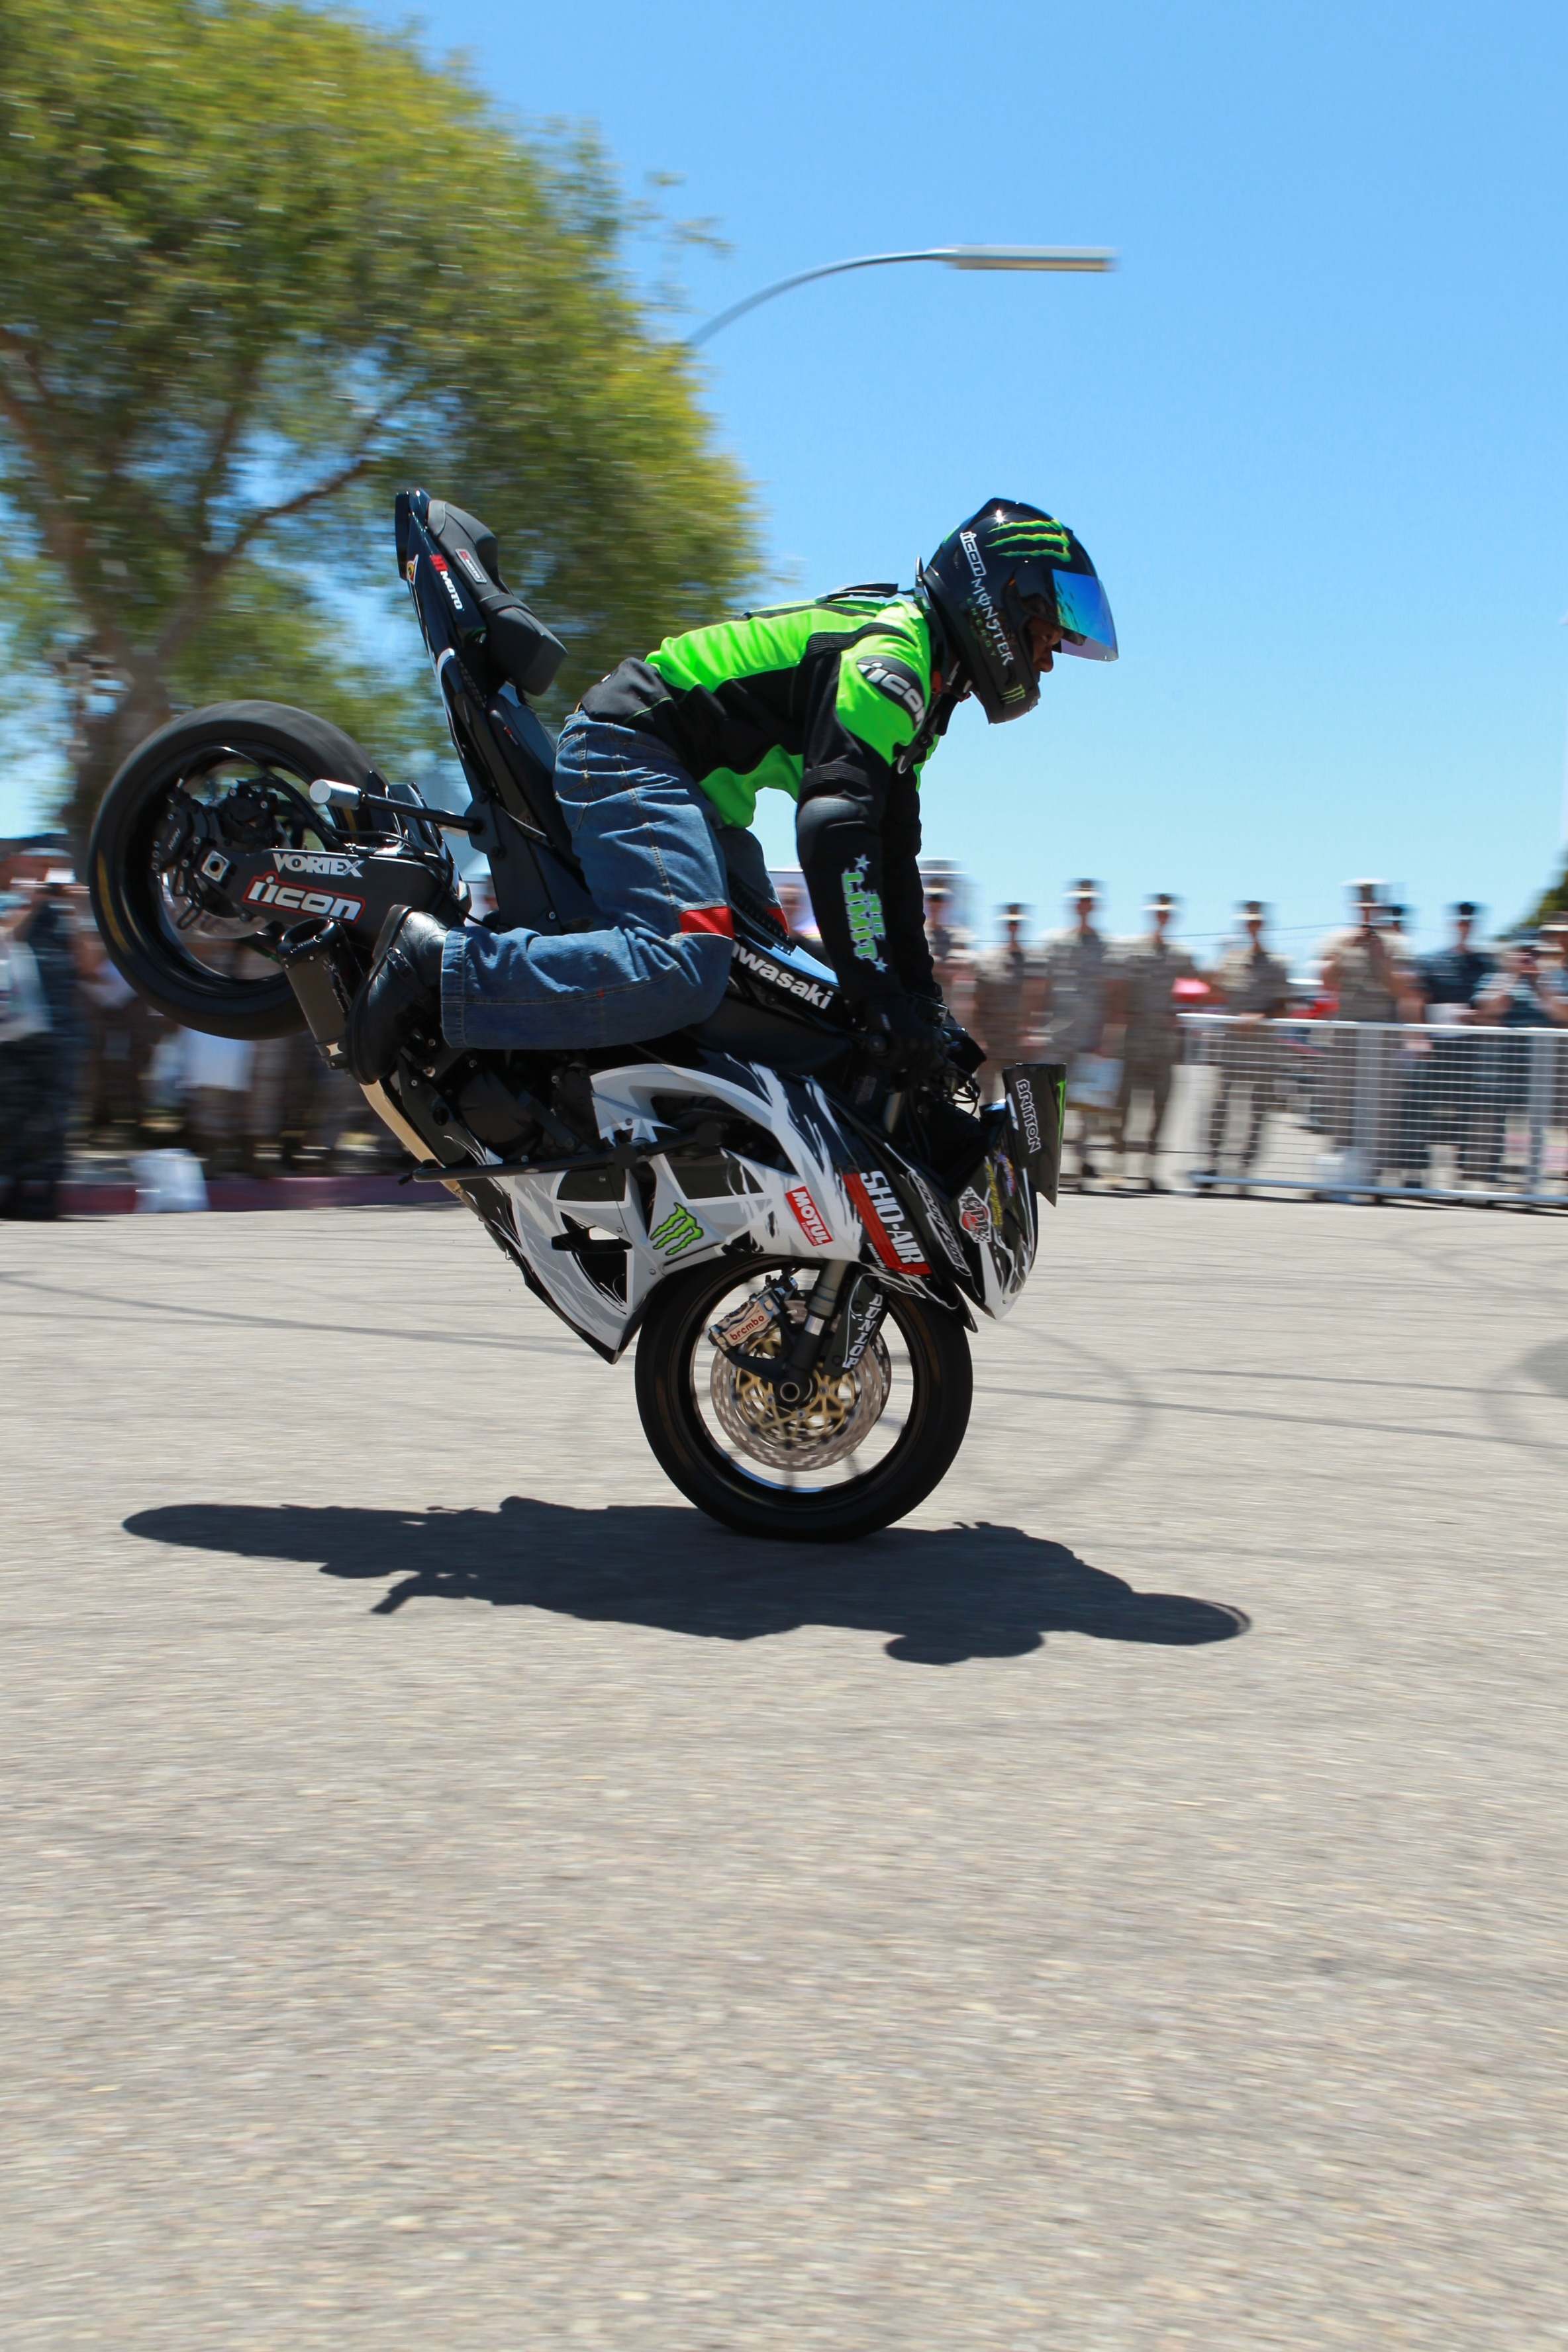 Bike Stunts, Activity, Bike, Motor, Motorcycle, HQ Photo